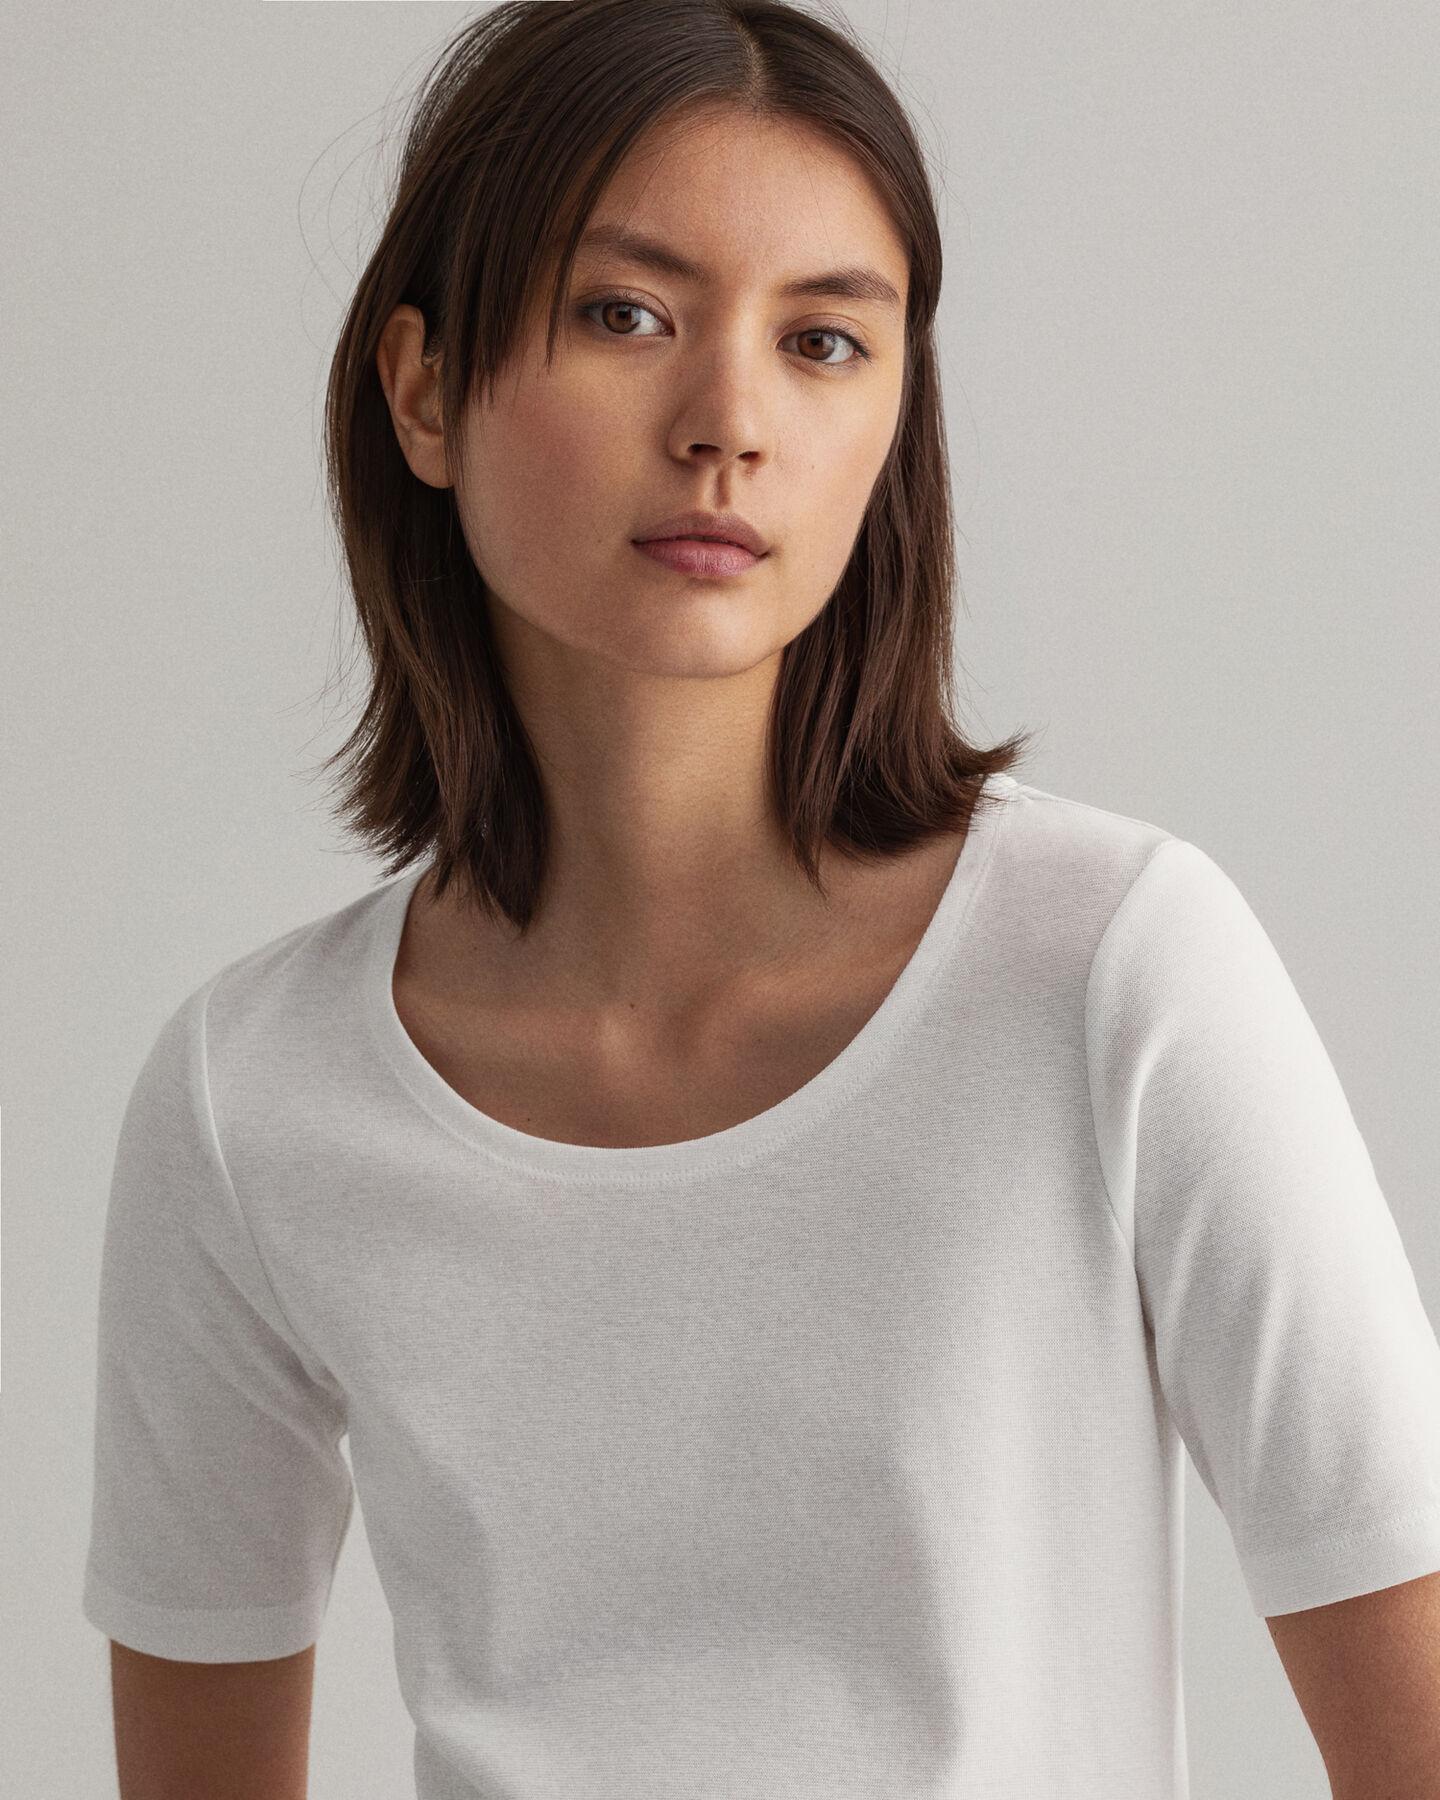 Geripptes T-Shirt mit halblangem Arm